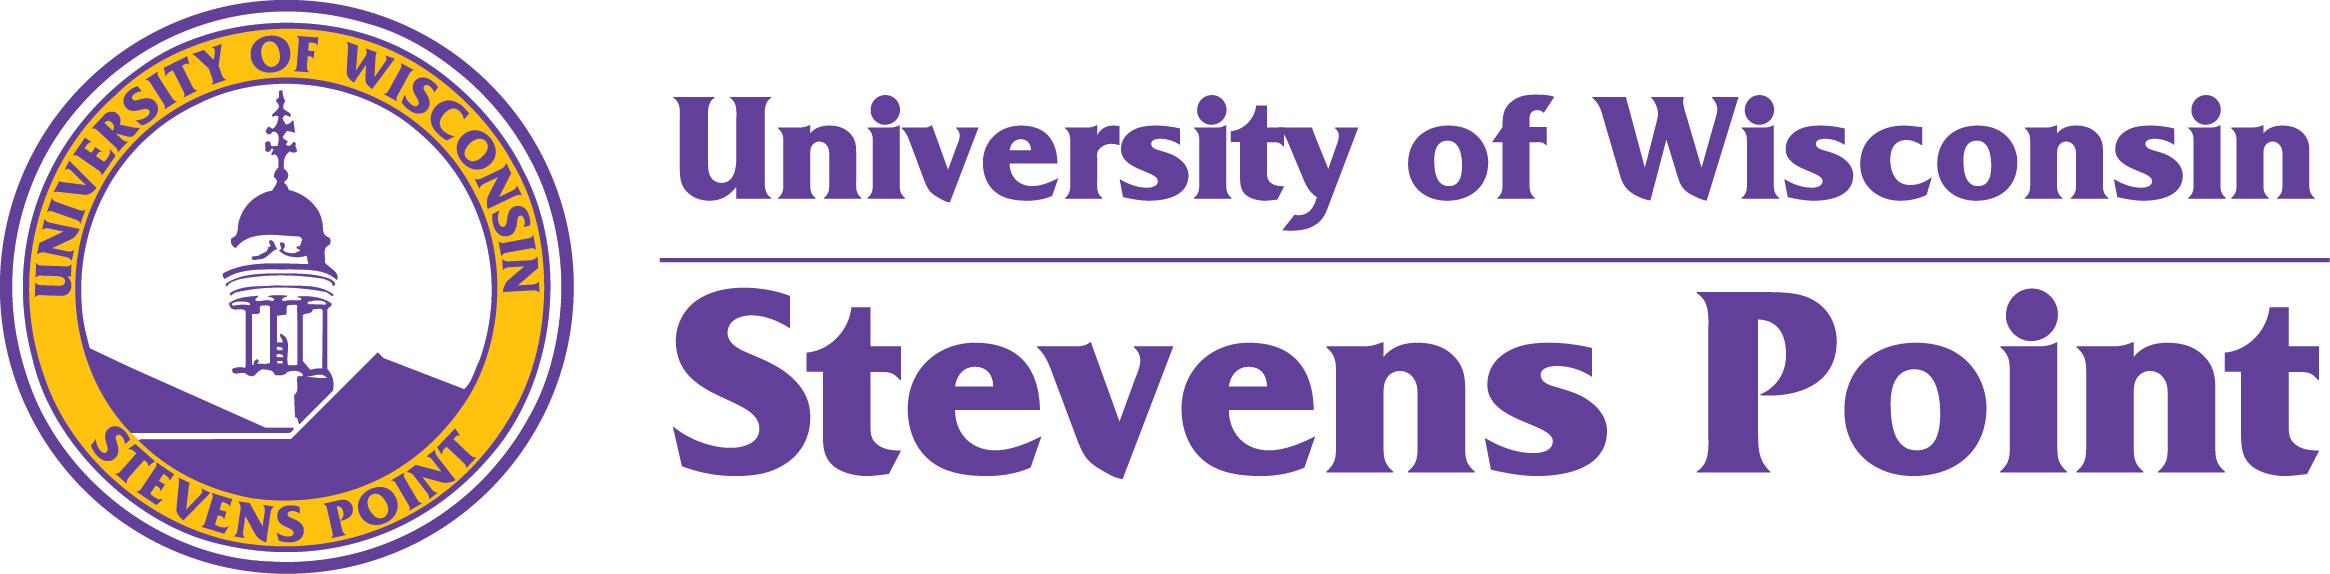 full-logo-colorB